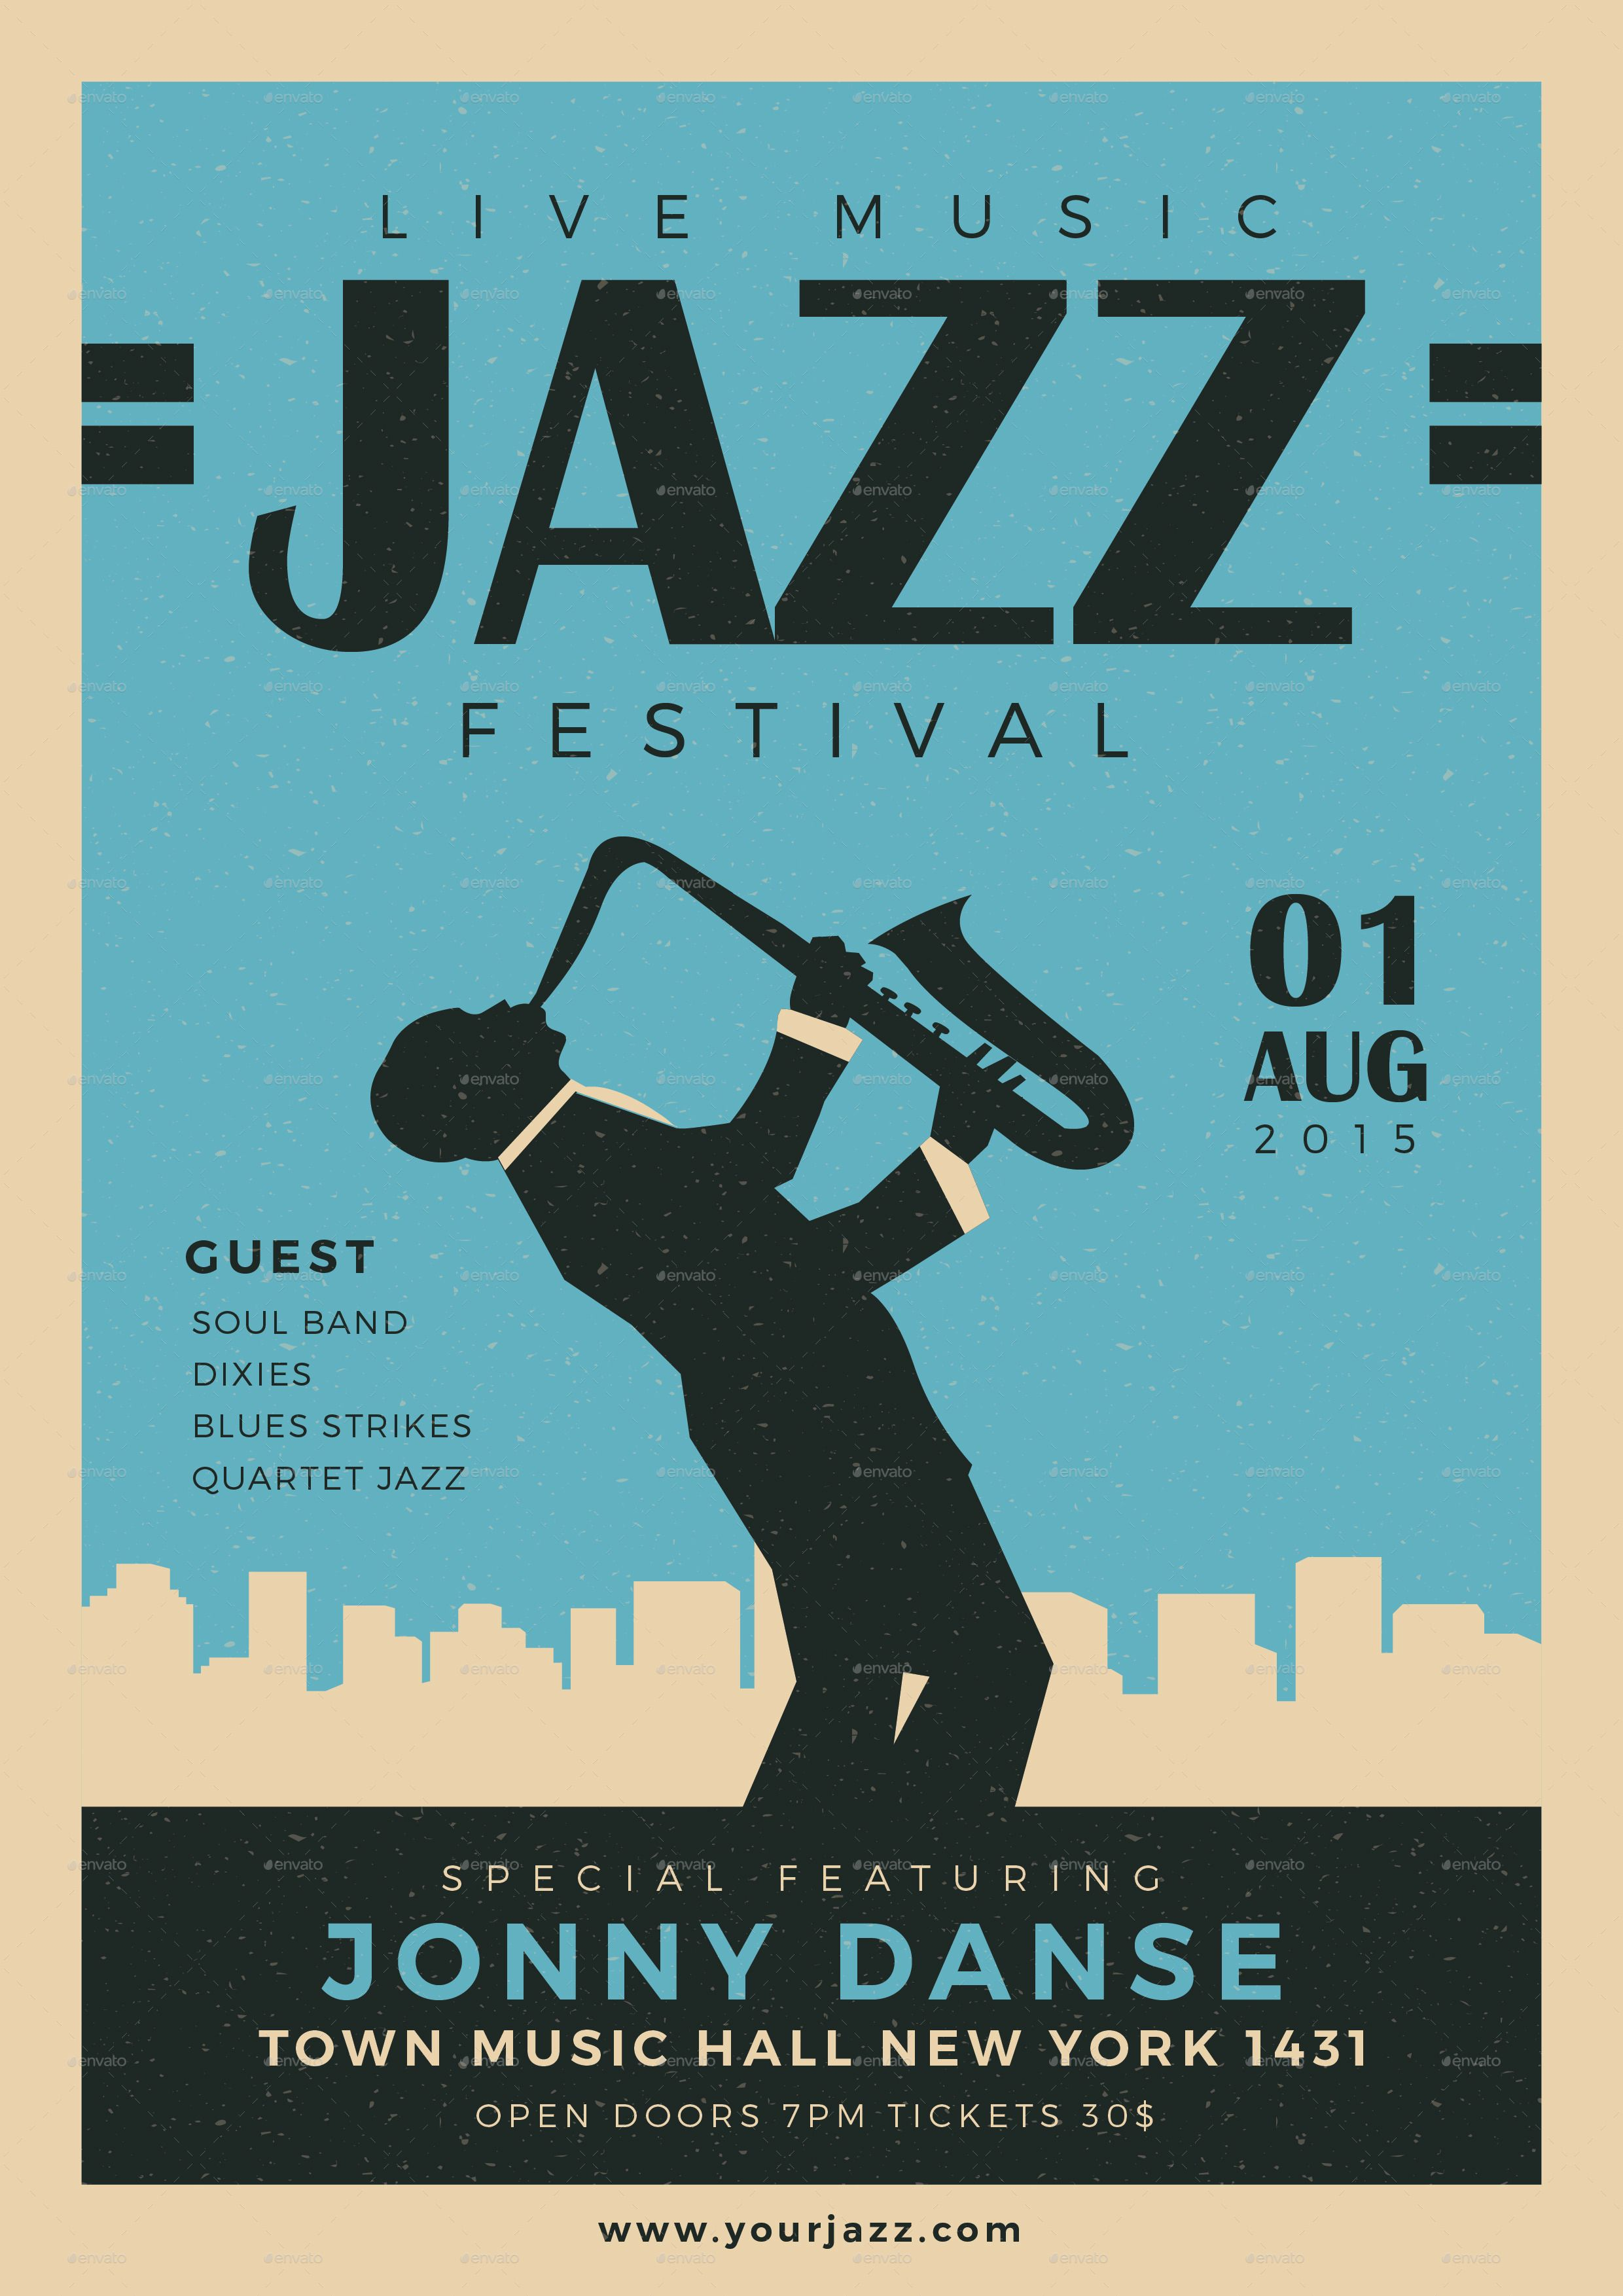 02 Old Jazz Festival Flyer Blue